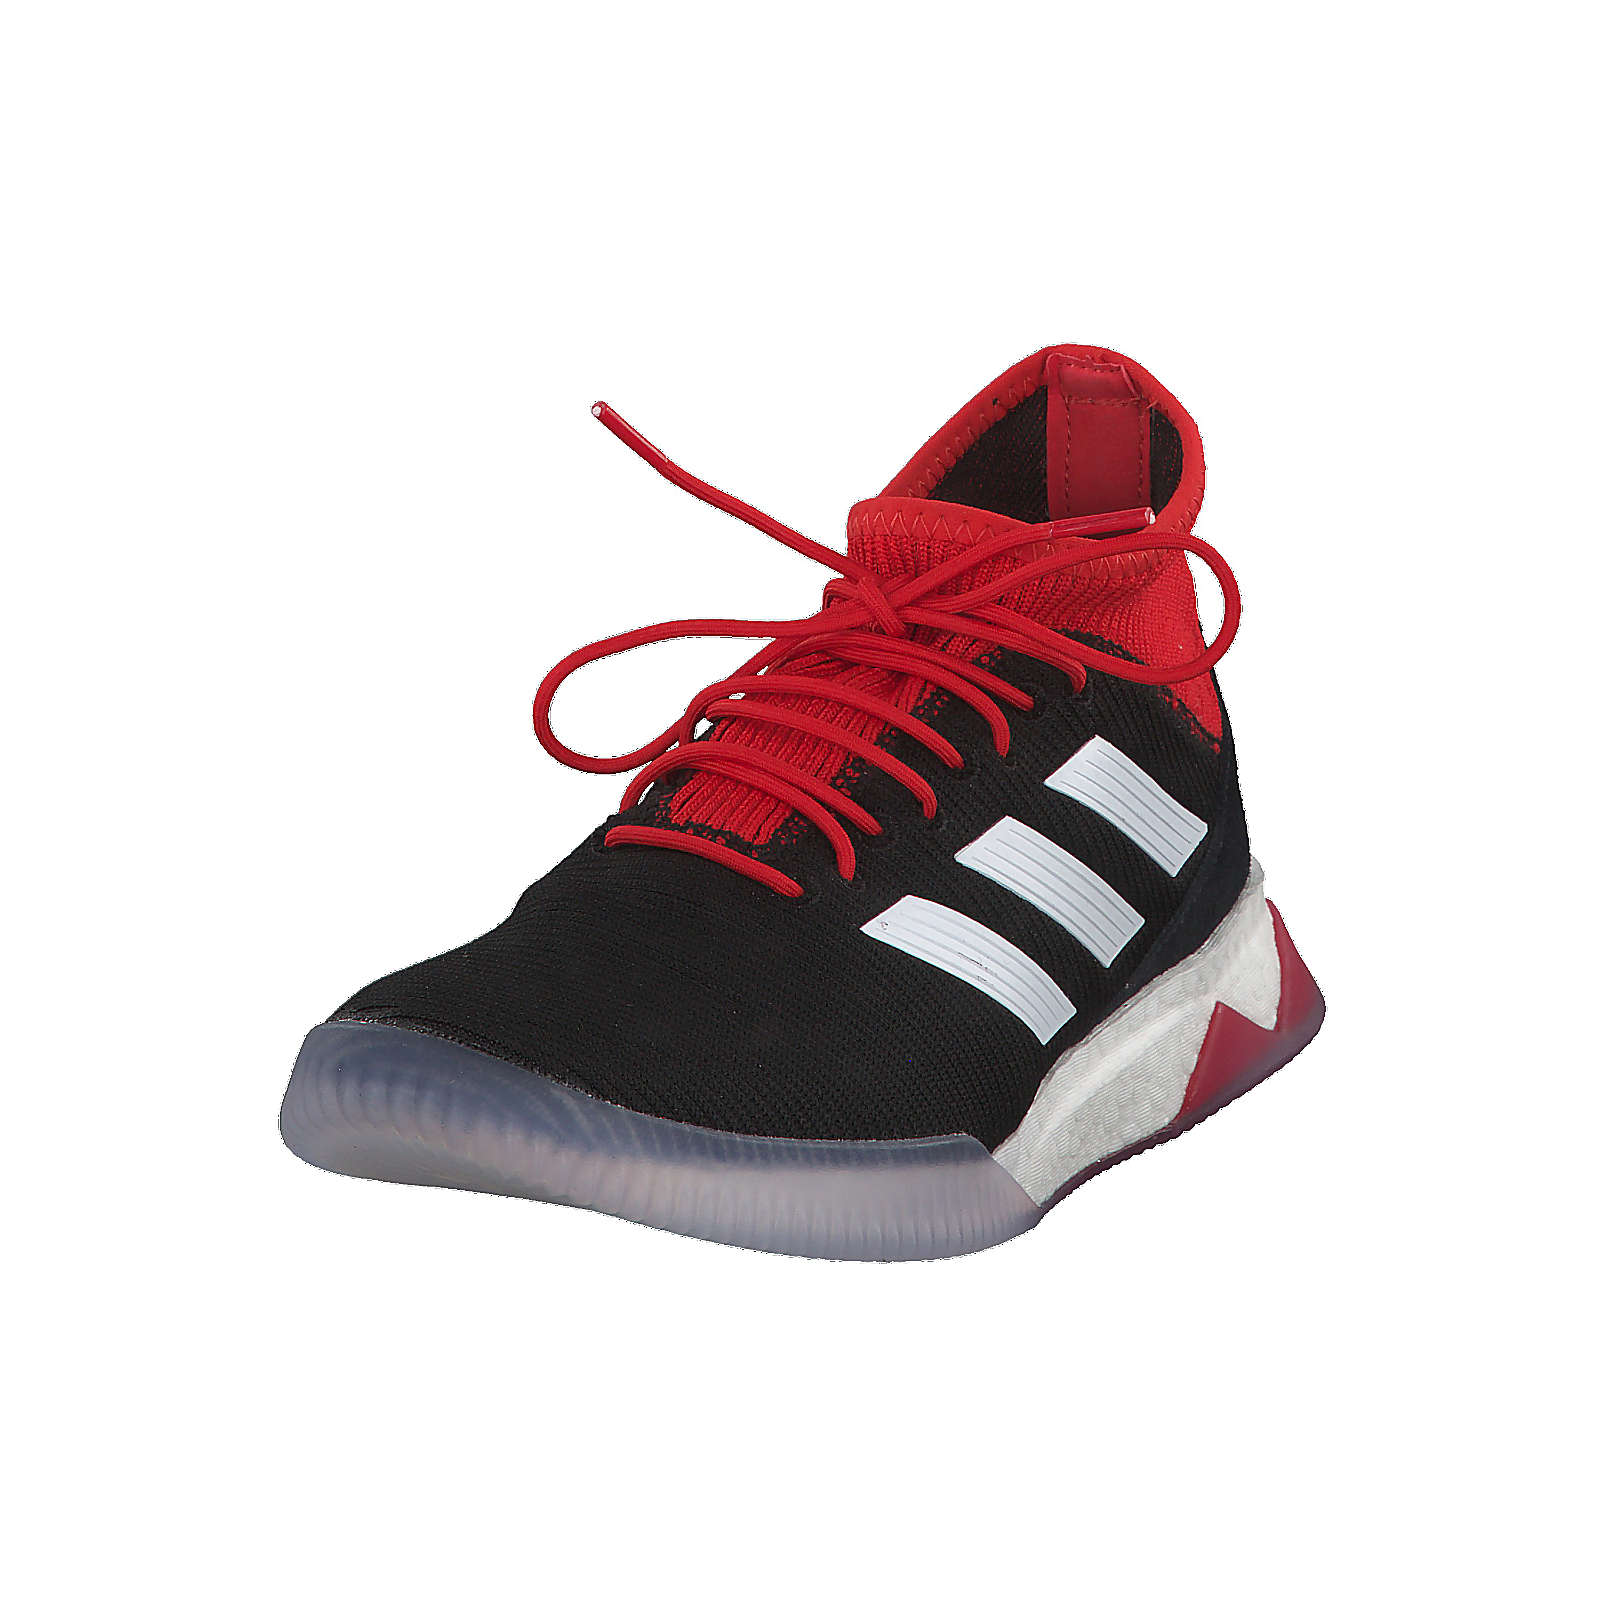 adidas Performance Fußballschuhe weiß-kombi Herren Gr. 42